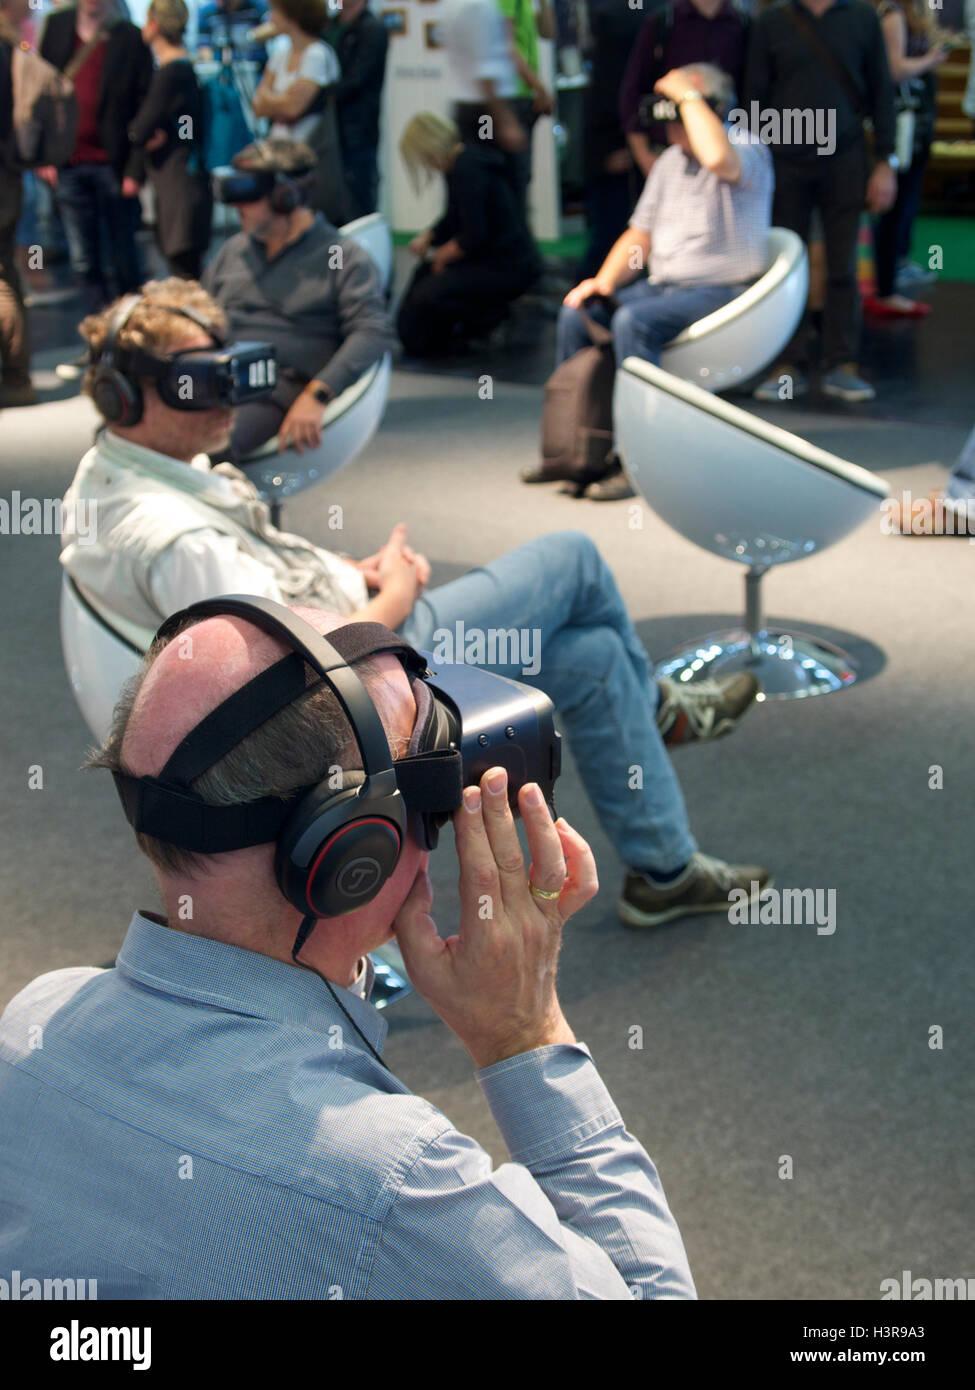 Applying Männer genießen VR-Demonstration auf der Photokina 2016 in Köln Stockbild